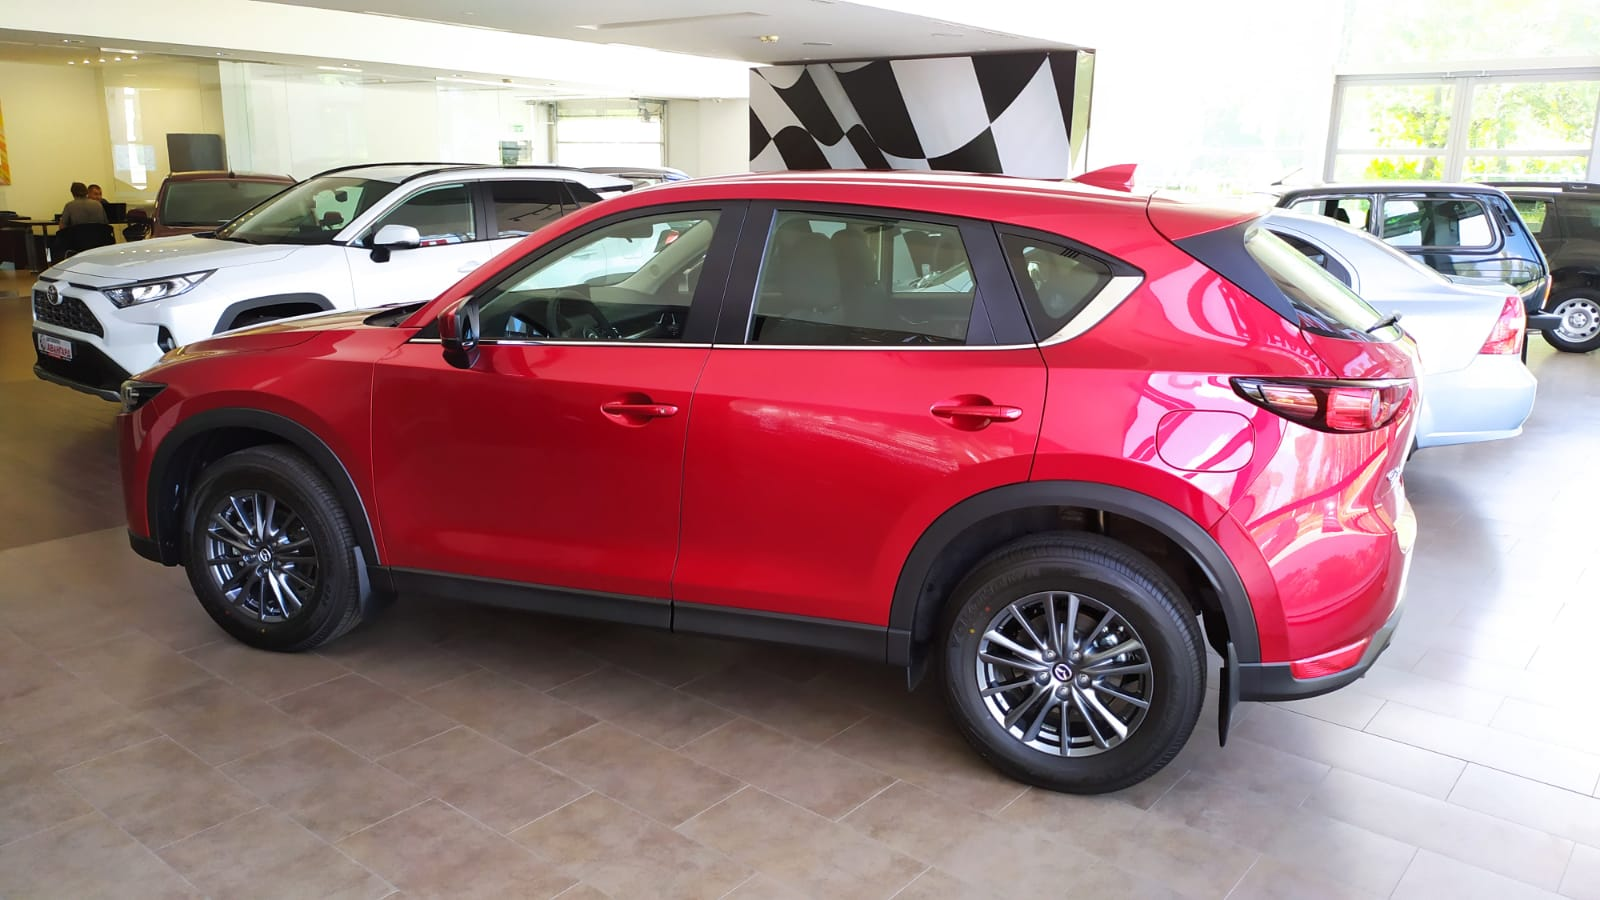 Mazda CX-5 2.0 150 л.с. 6АТ 4х4 Active, Красный, 2021